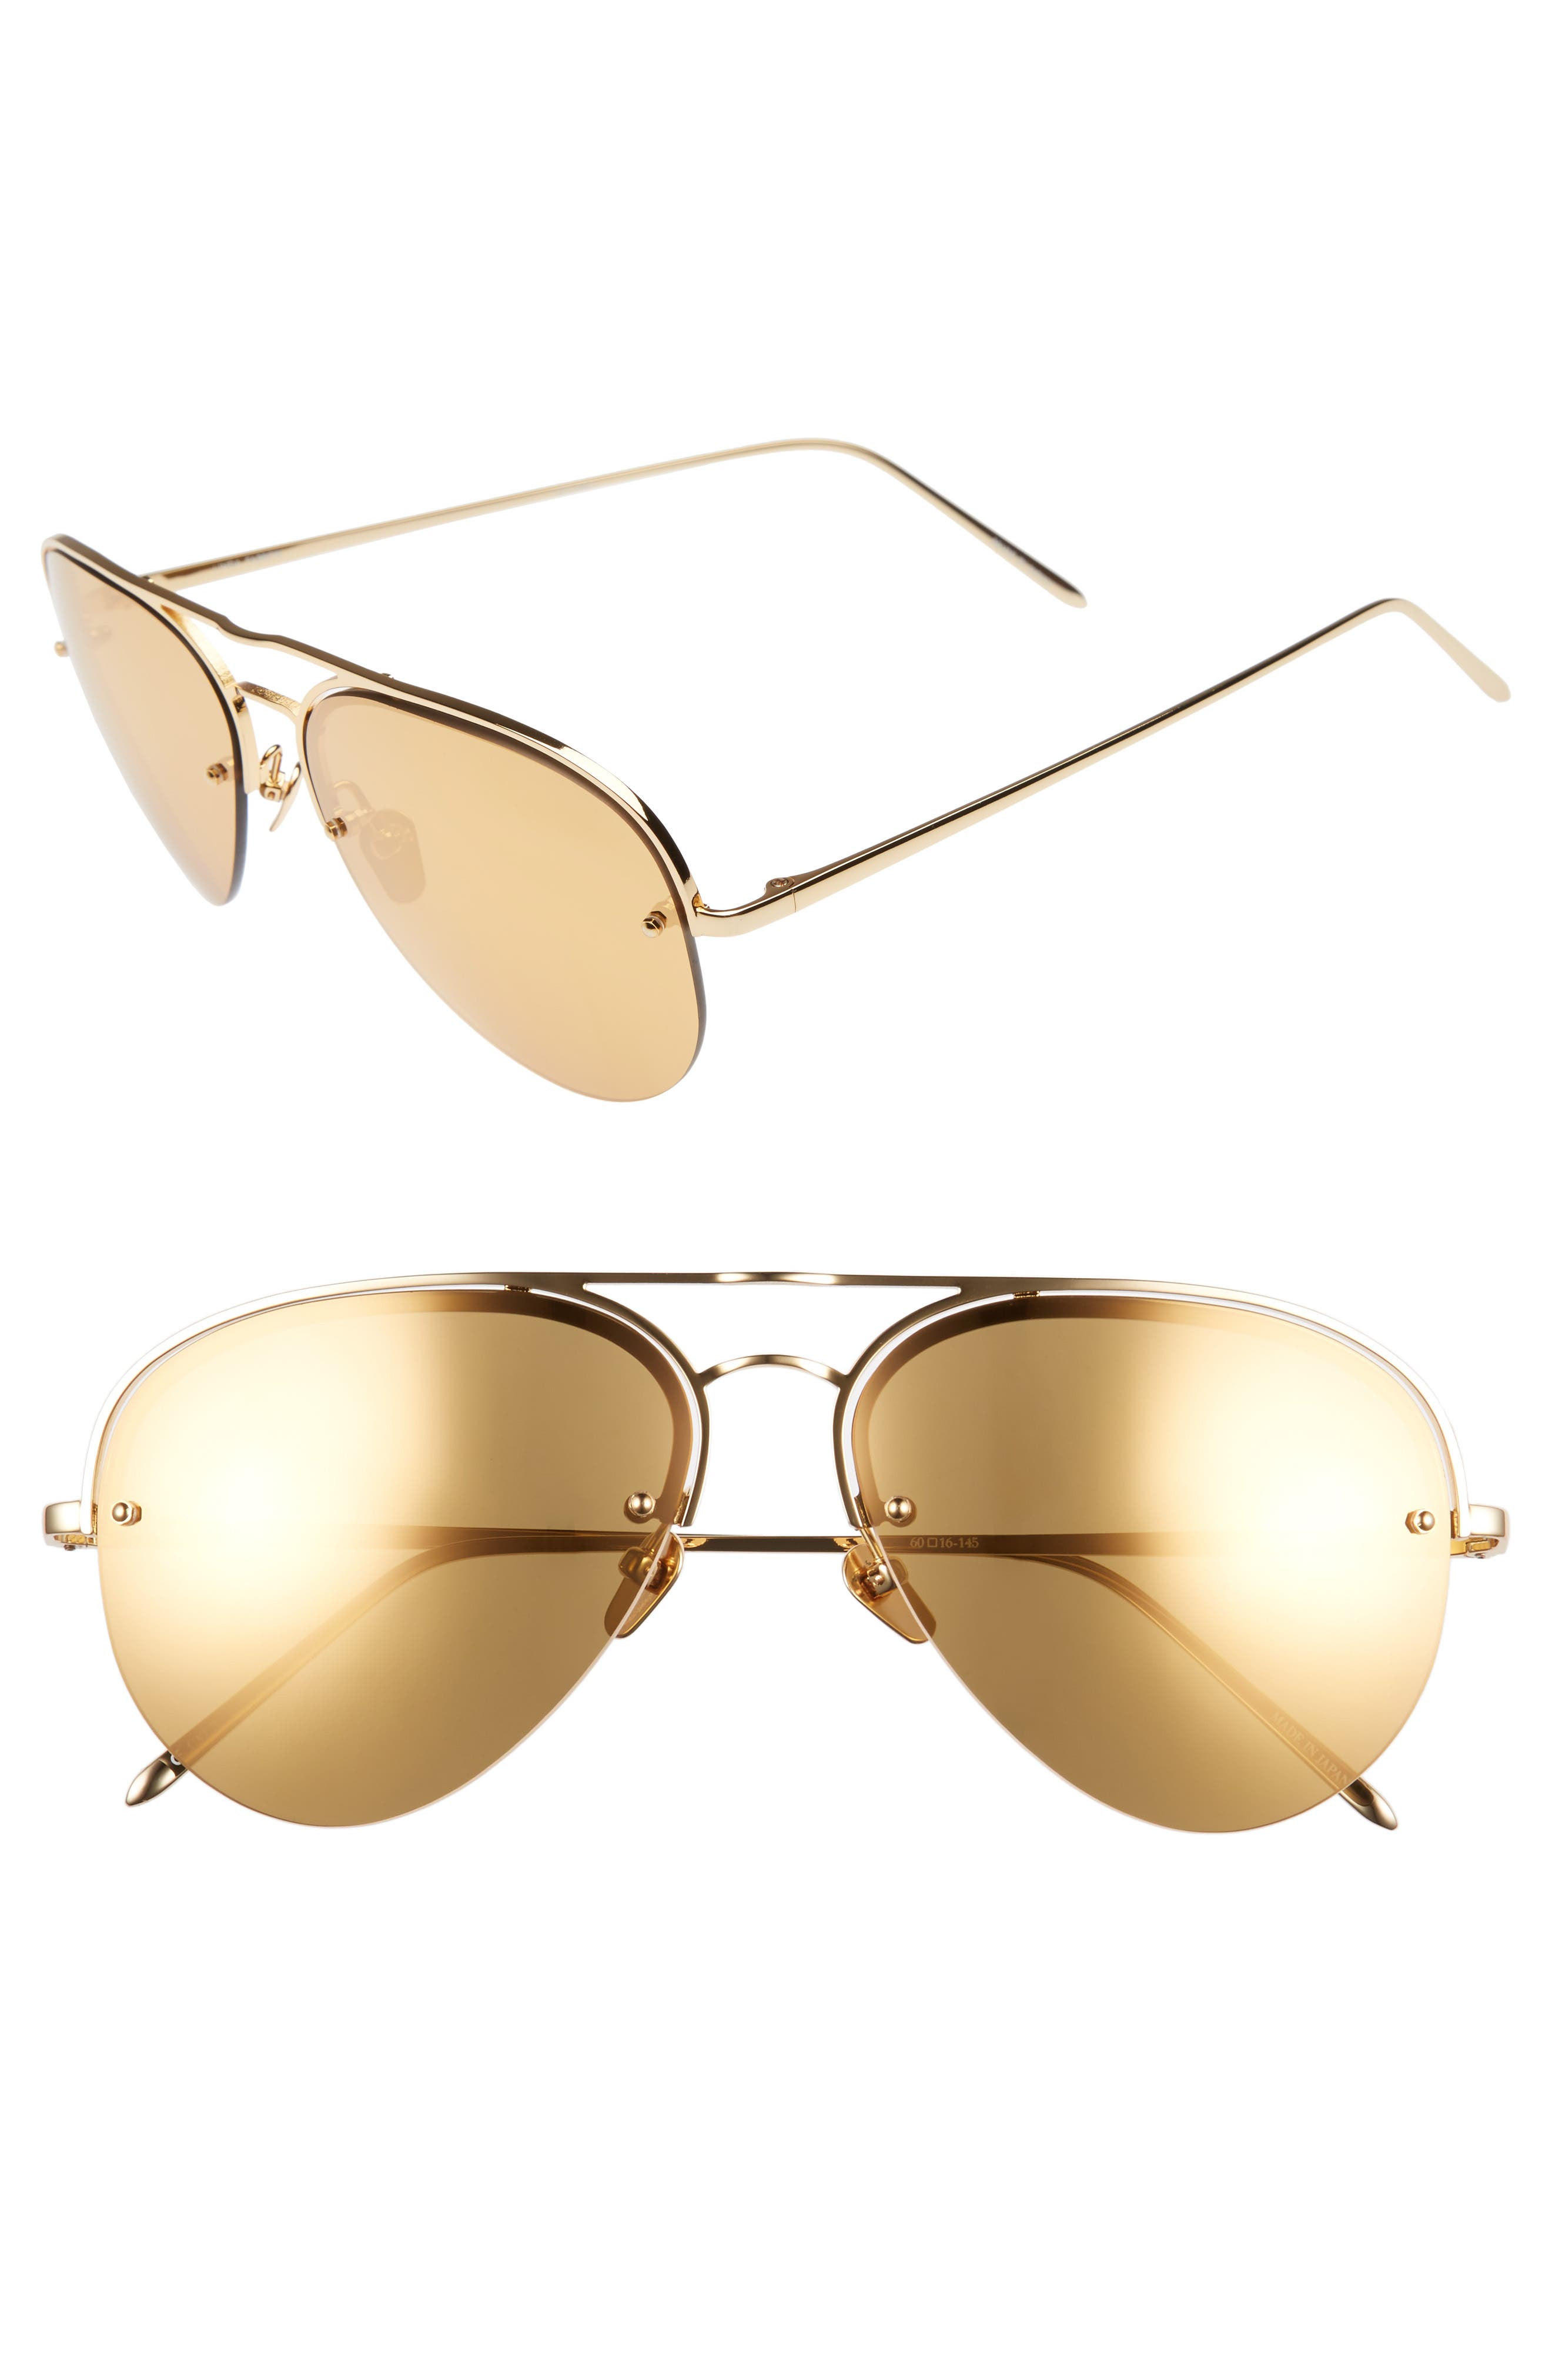 Main Image - Linda Farrow 60mm Mirrored 22 Karat Gold Aviator Sunglasses